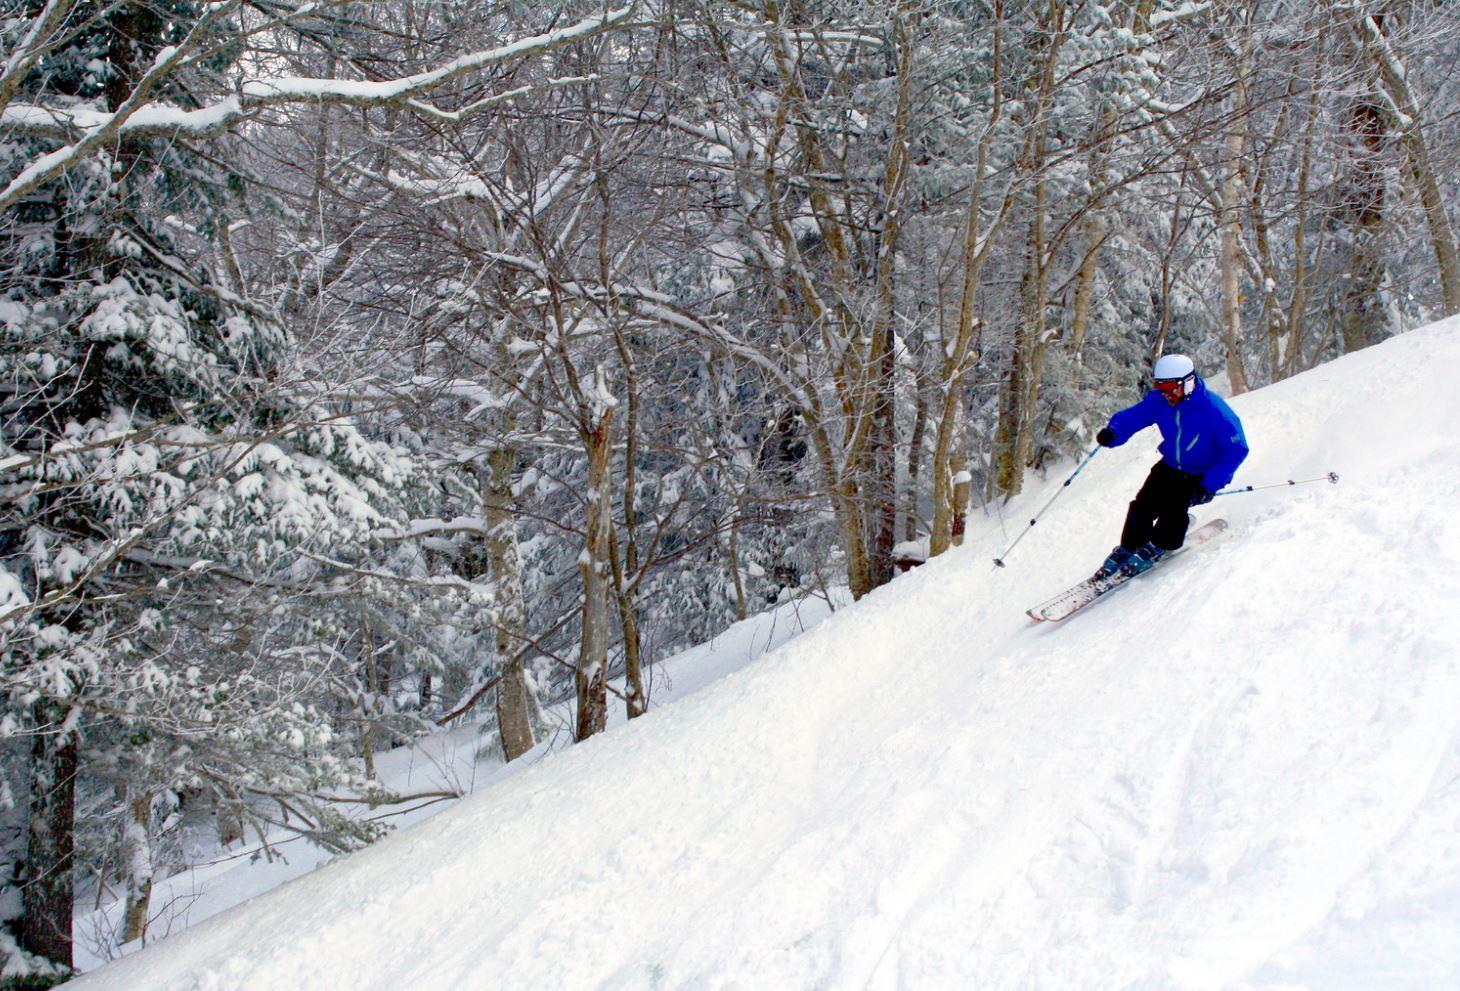 iski - ski resort bolton valley - unknown